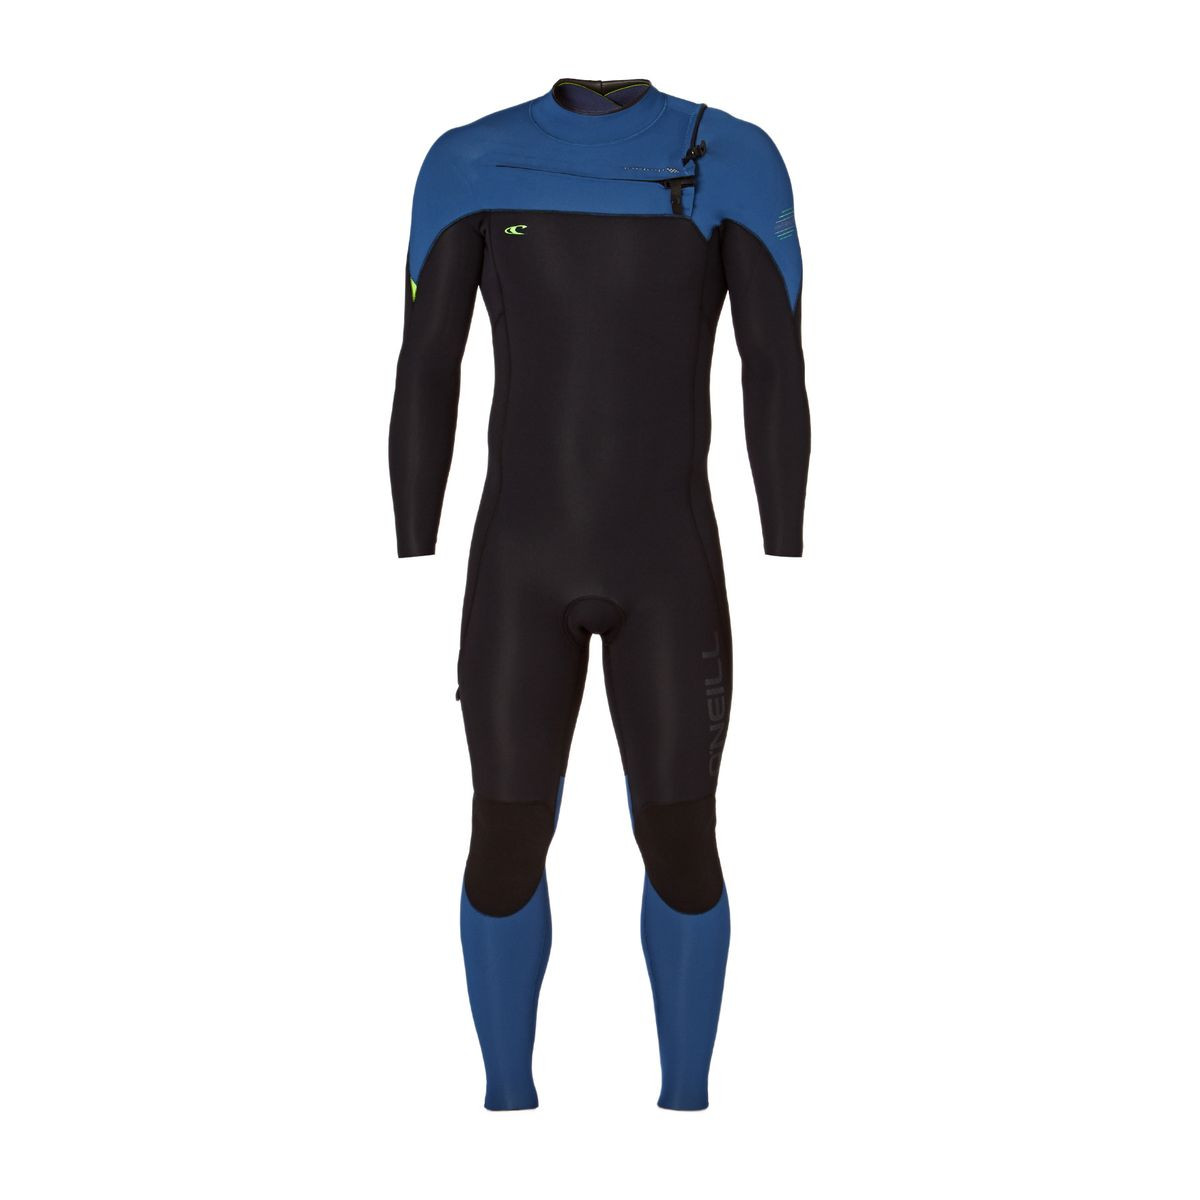 O'Neill Hyperfreak 4/3mm 2017 Chest Zip Wetsuit - Black/ Deep Sea/ Day Glow